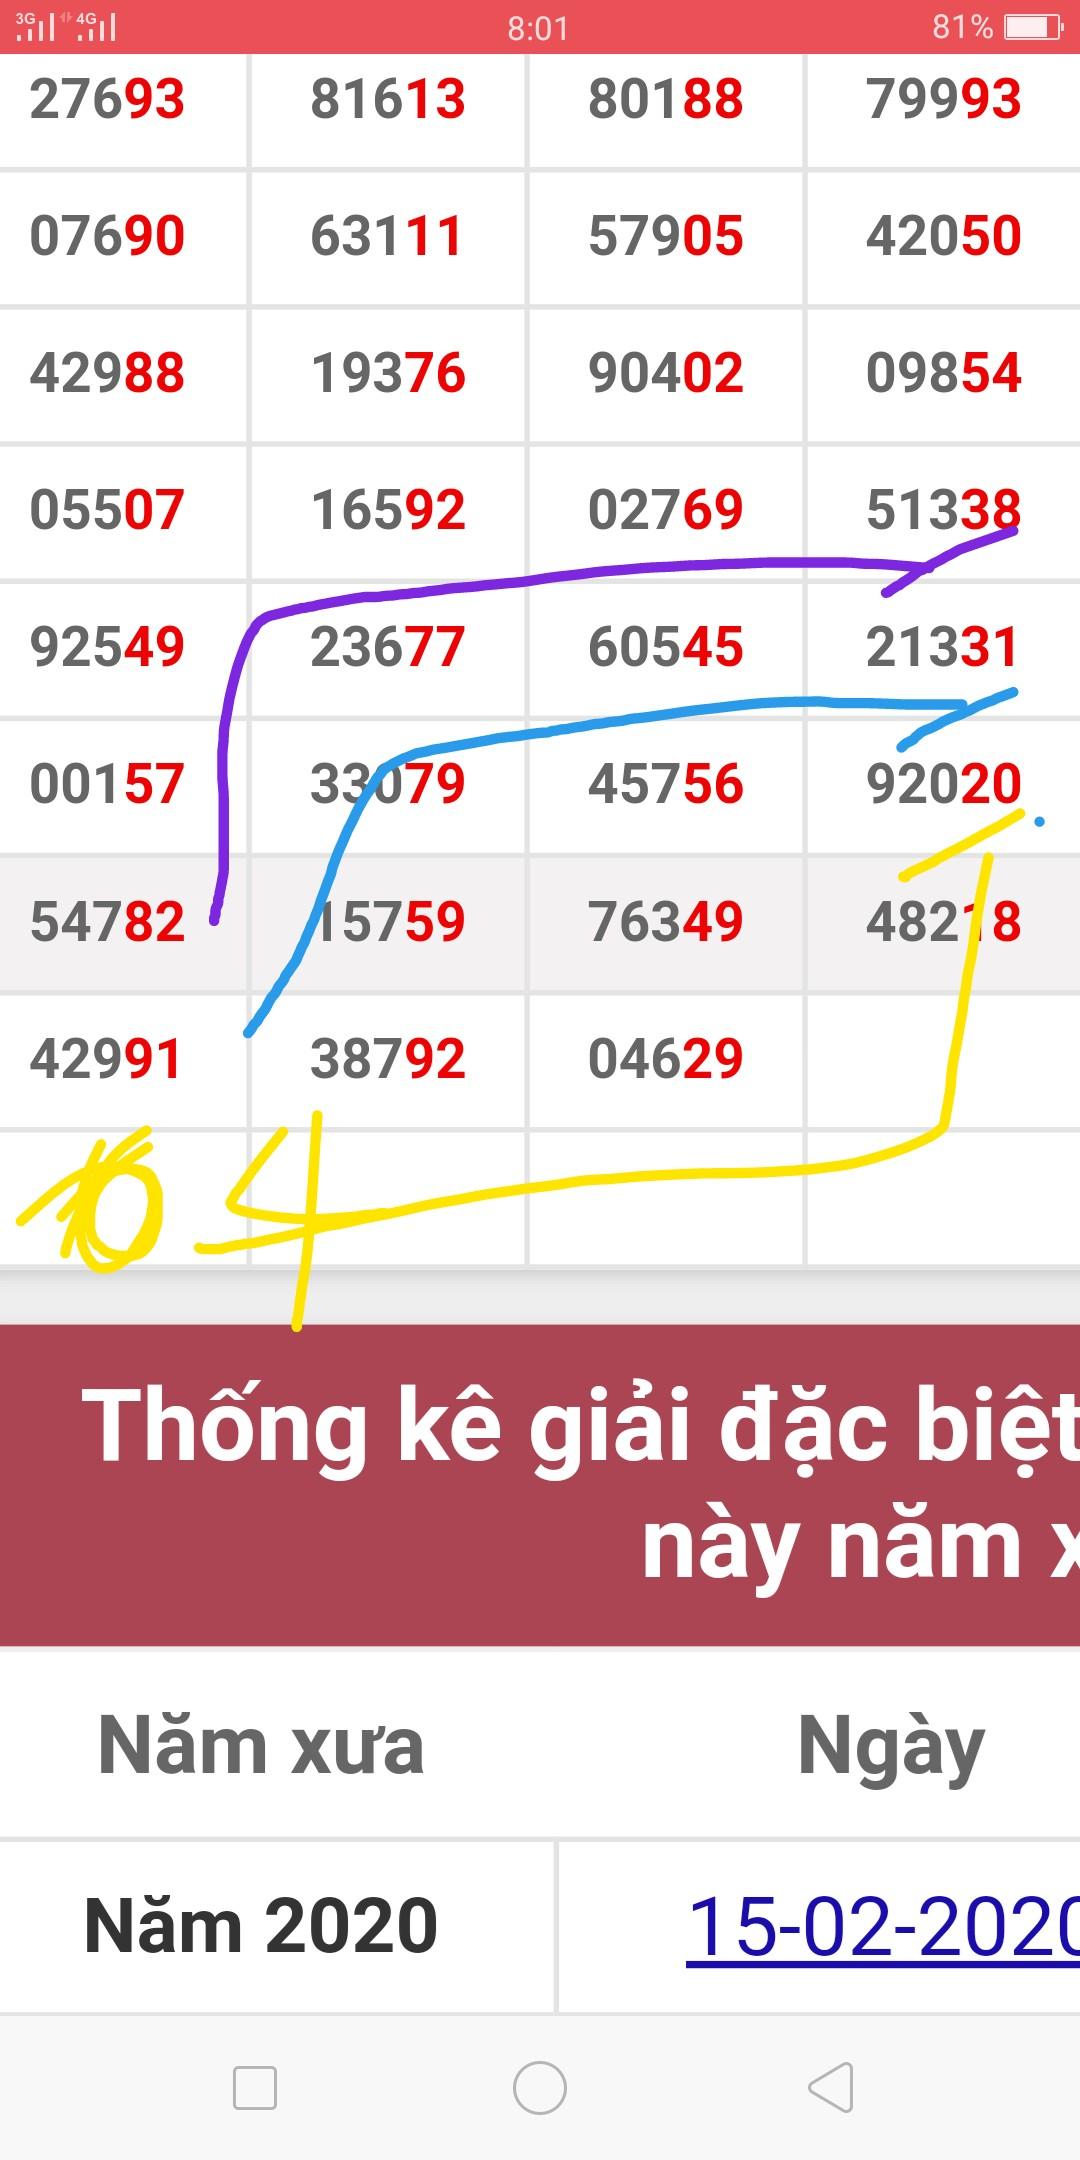 IMG_20210215_080546.jpg